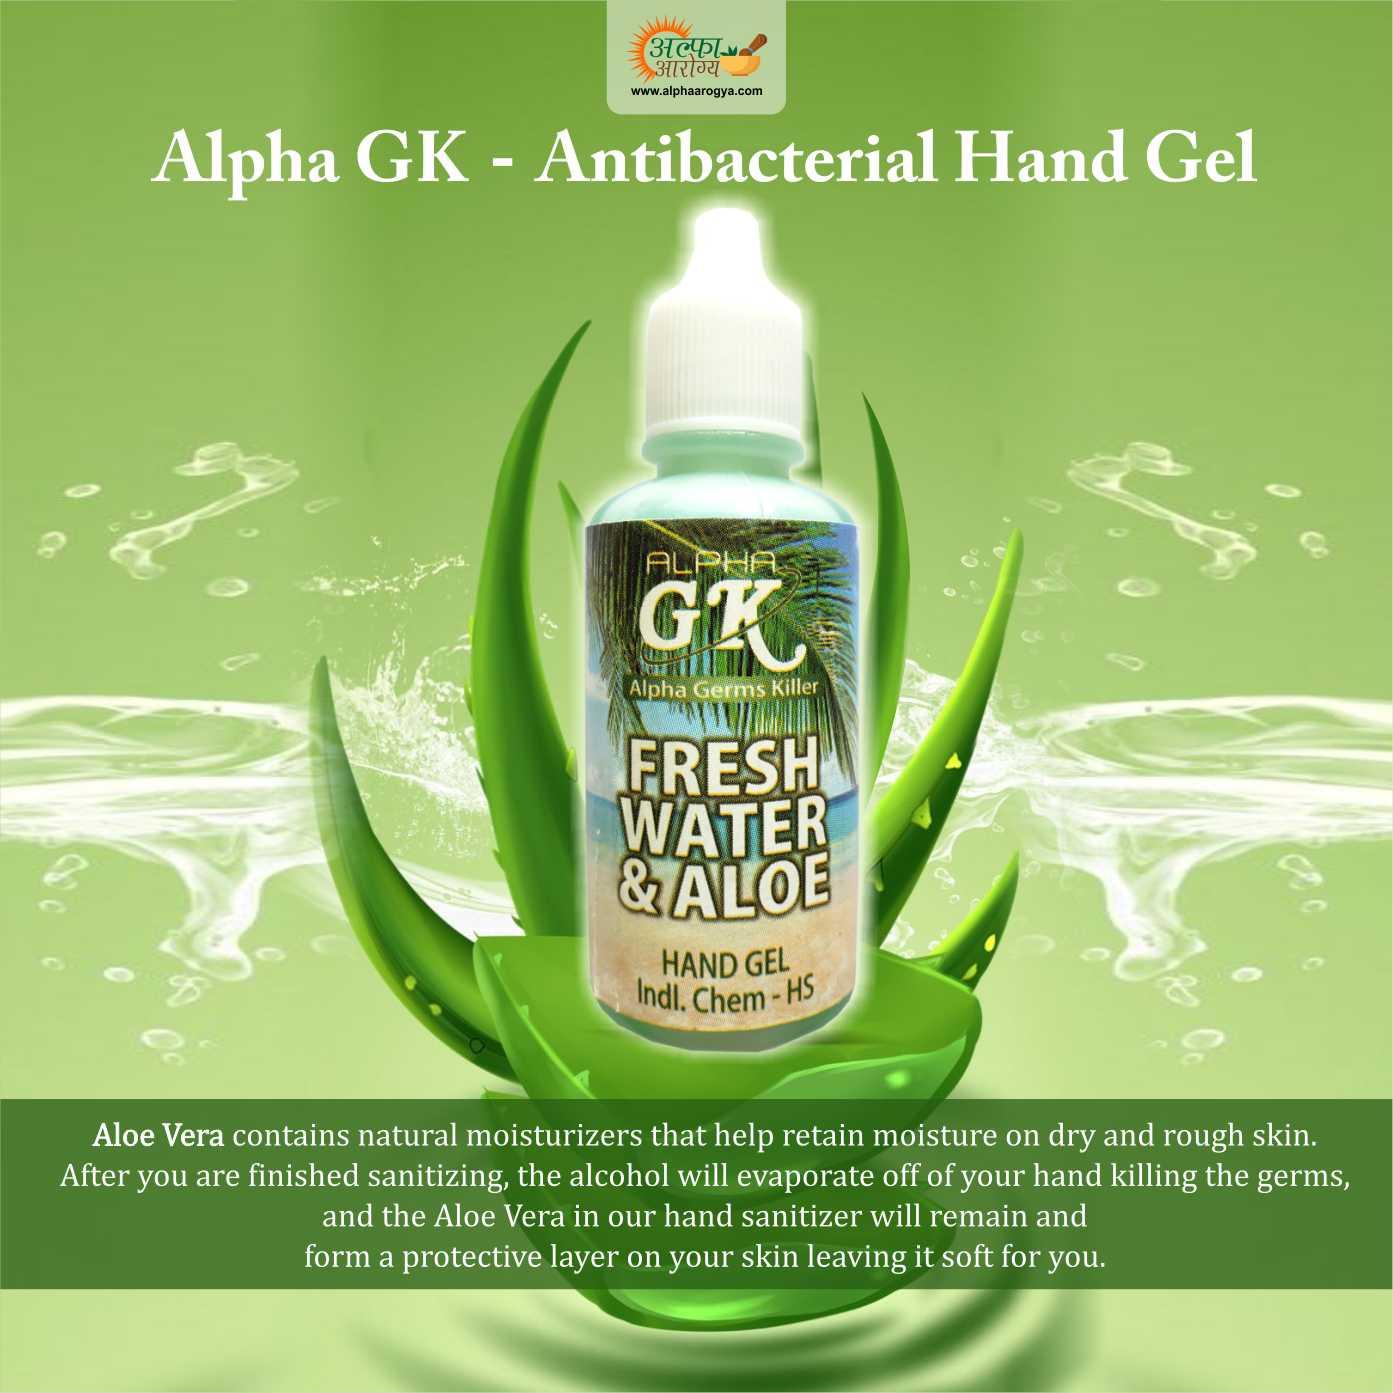 Alpha Germs Killer - Anti-bacterial Hand Gel